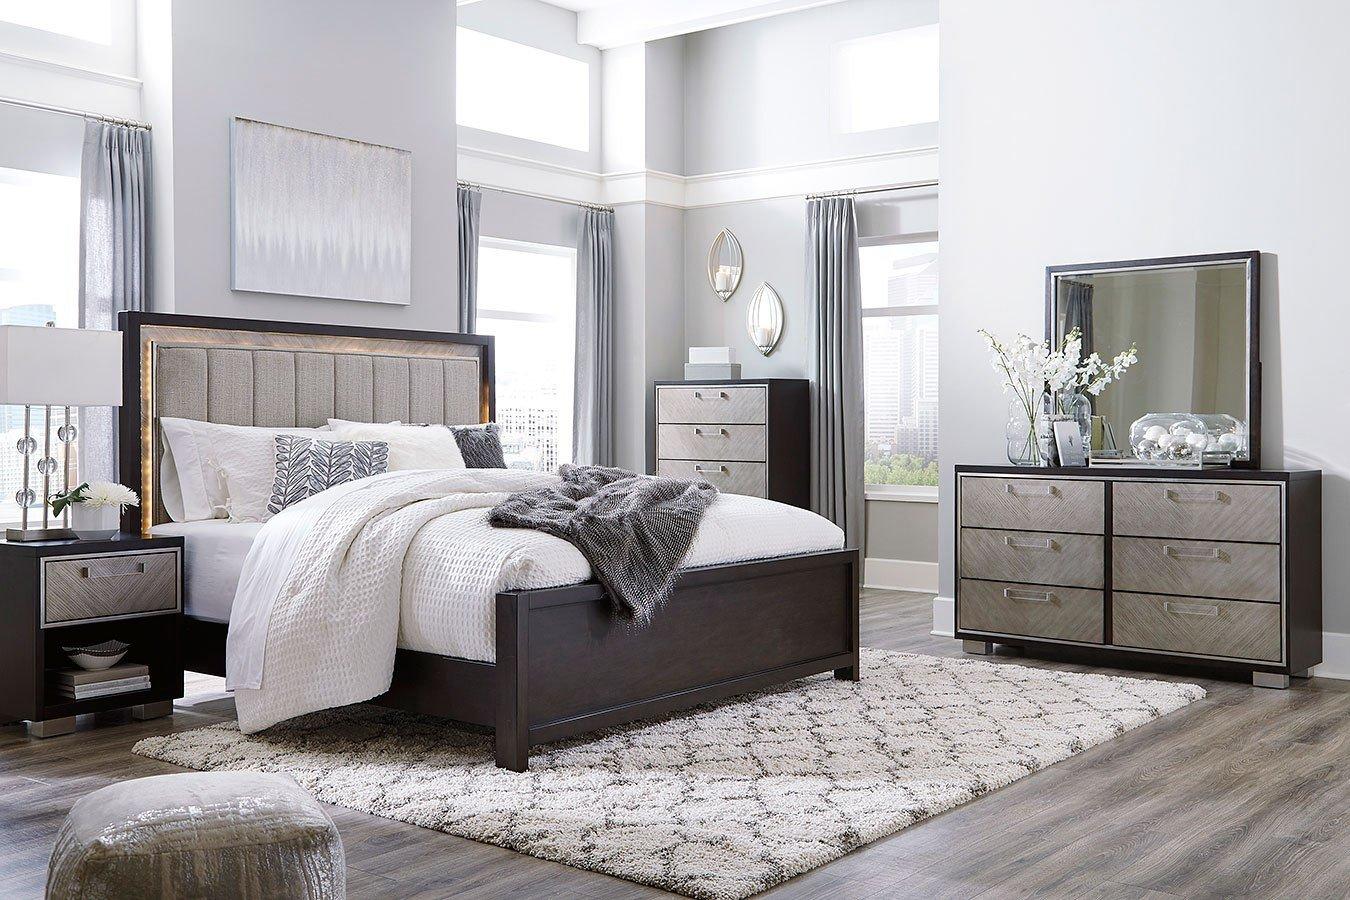 Ashley Furniture Bedroom Set Price Best Of Maretto Panel Bedroom Set